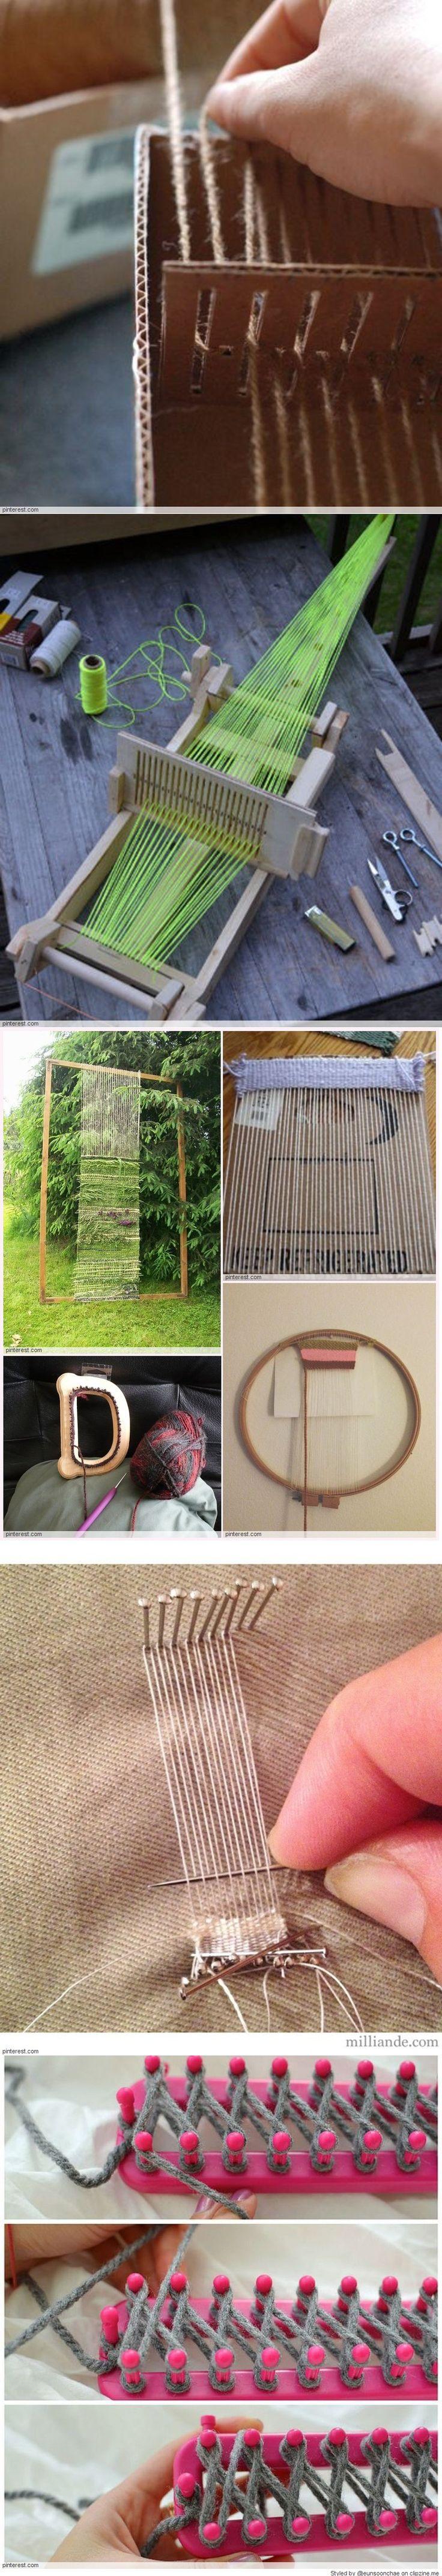 DIY Loom Ideas